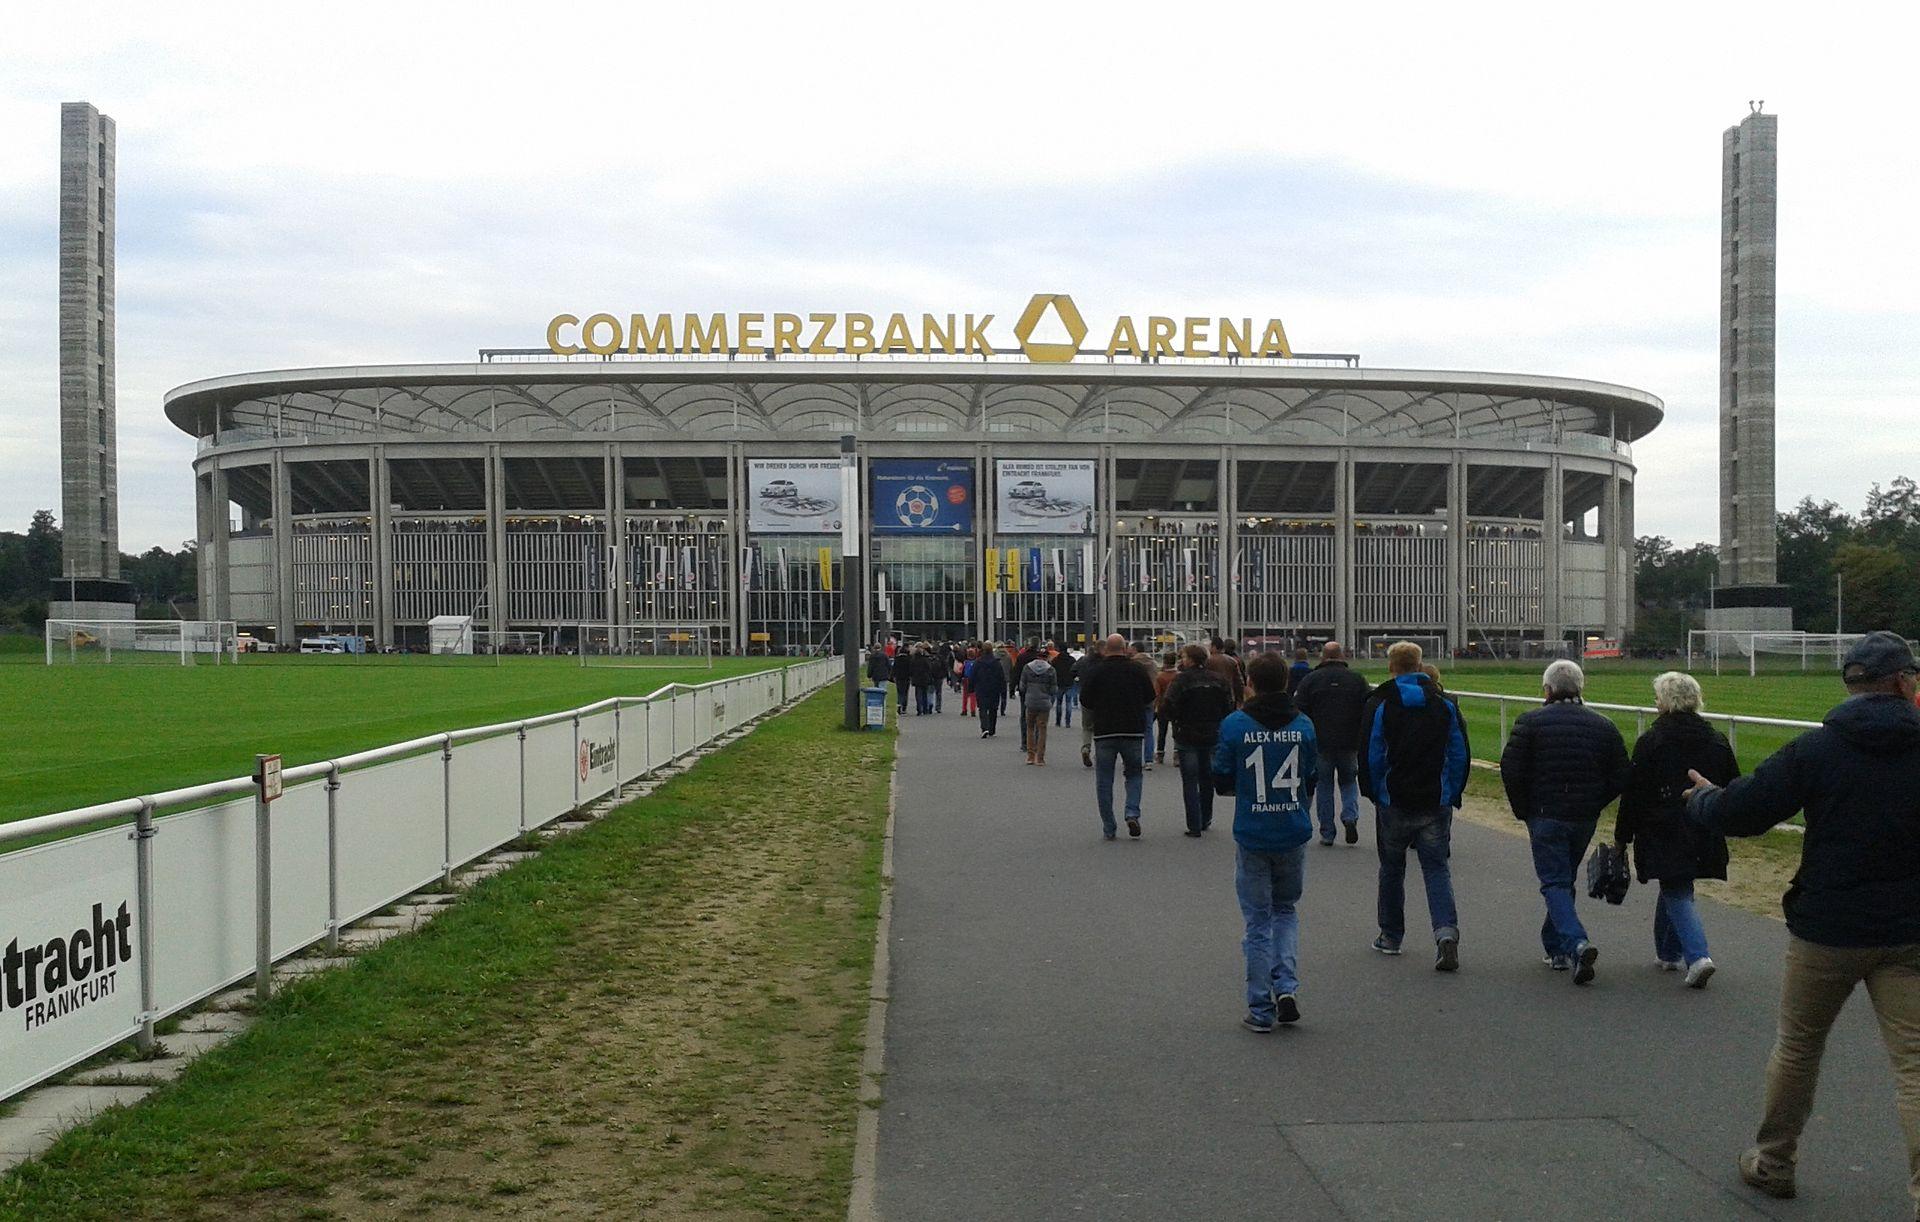 1920px-130919-Commerzbank-Arena-Europa-League.jpg